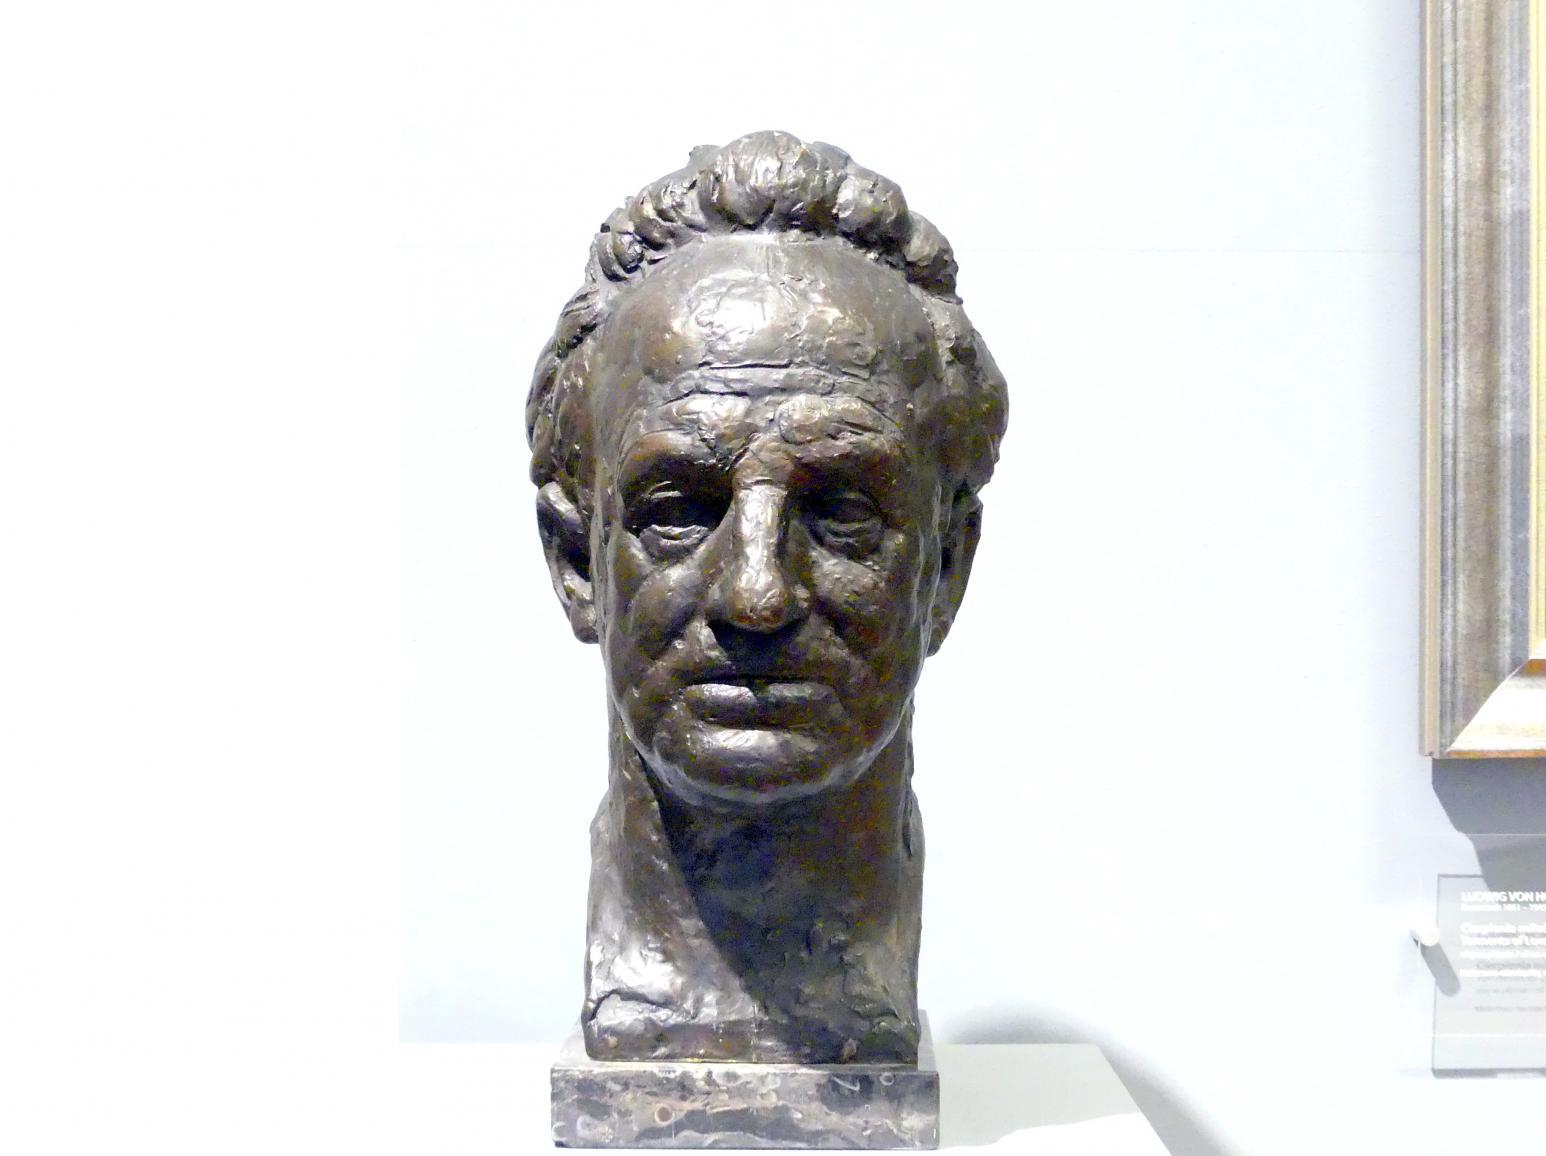 August Gaul: Büste Gerhart Hauptmann, 1917